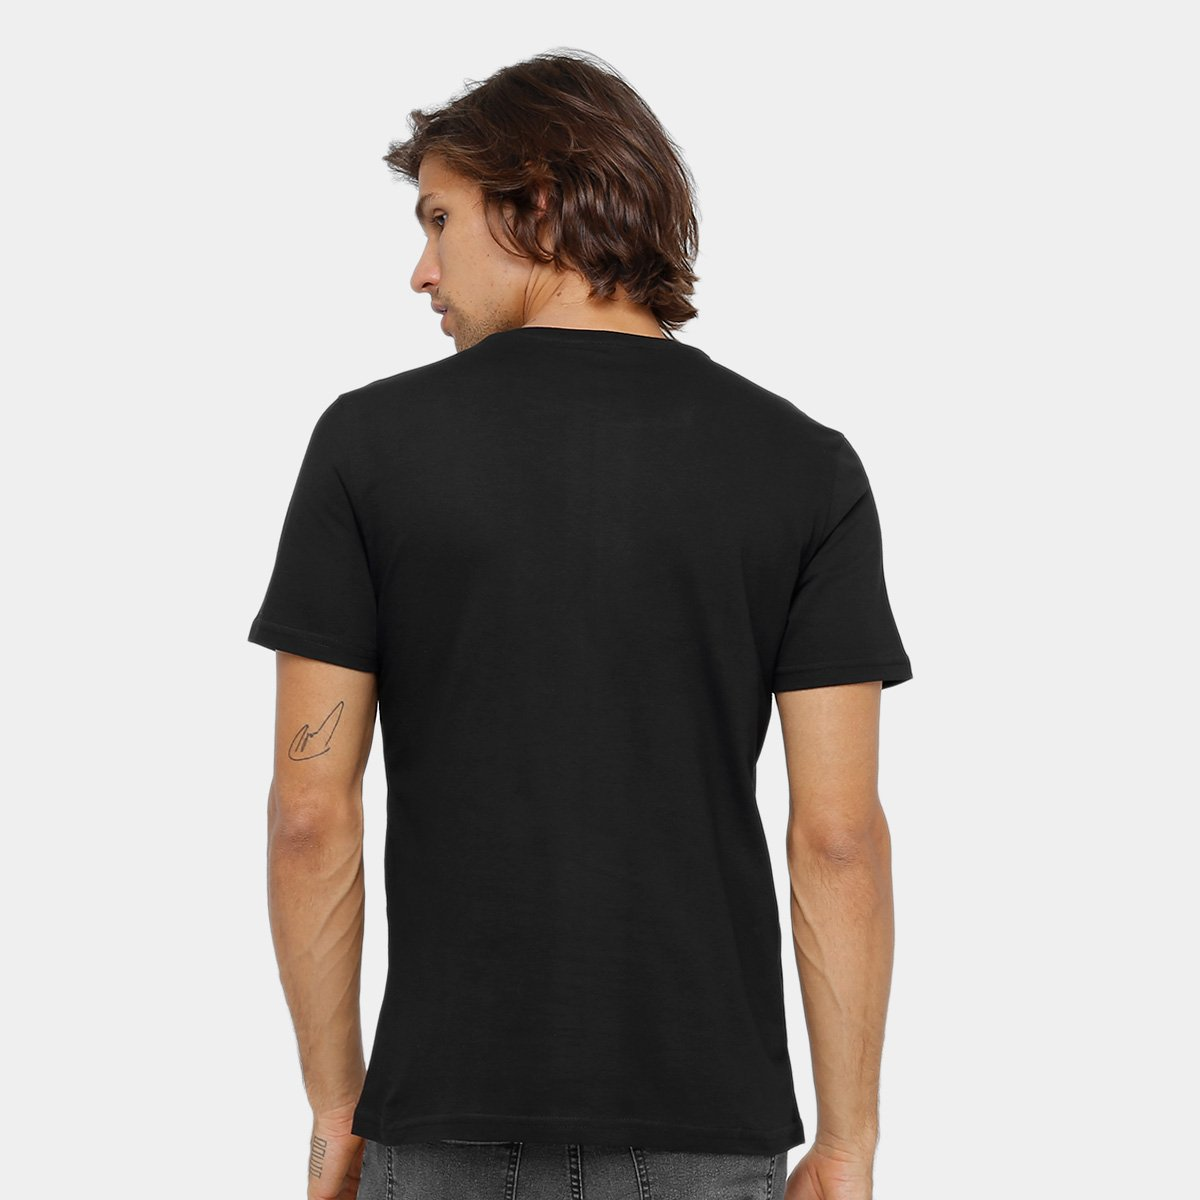 4b02315b084ba Camiseta Burn Estampa França Masculina  Camiseta Burn Estampa França  Masculina ...